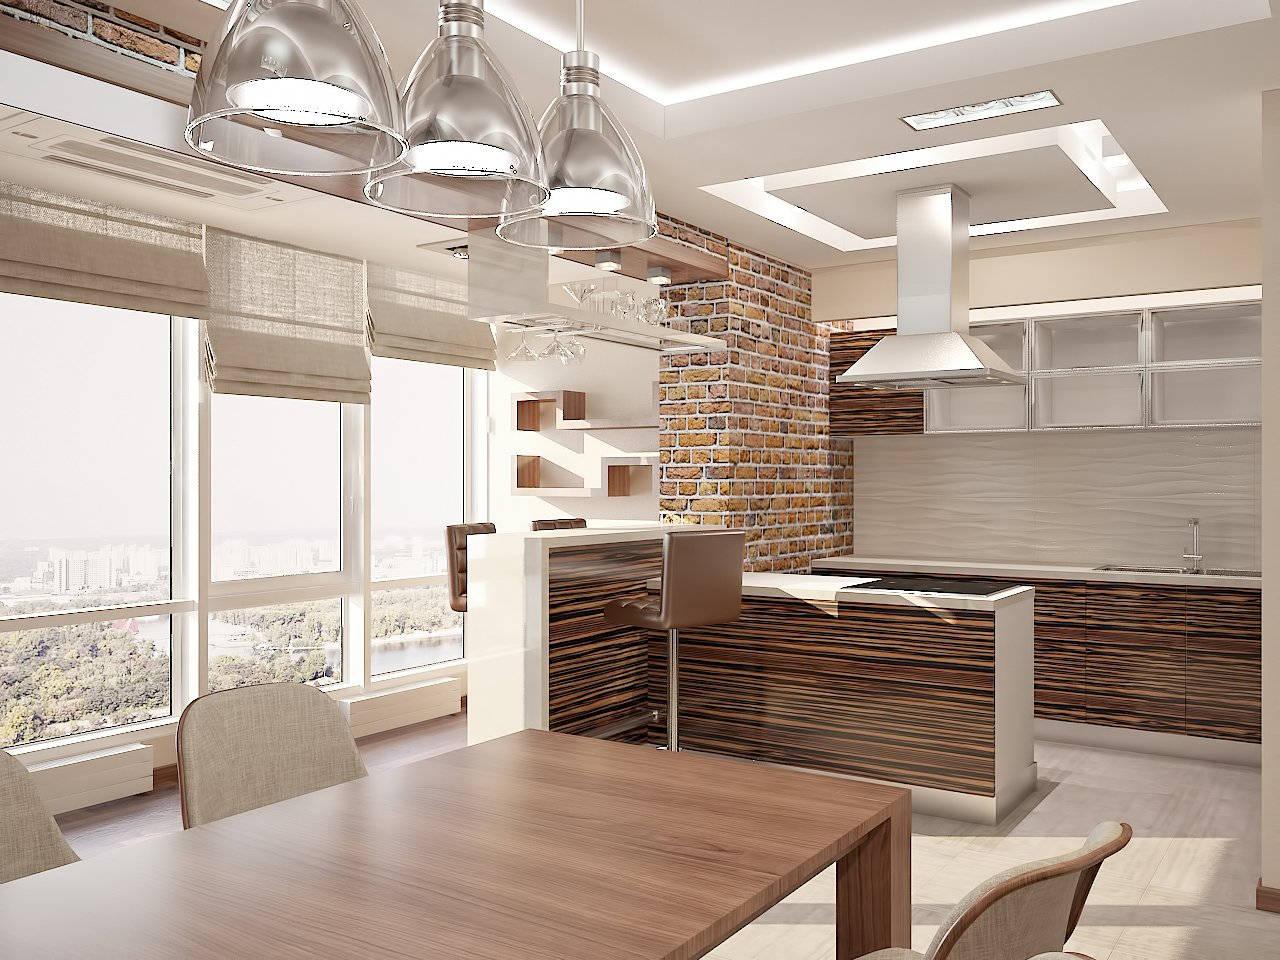 Дизайн кухни в квартире Киев под дерево